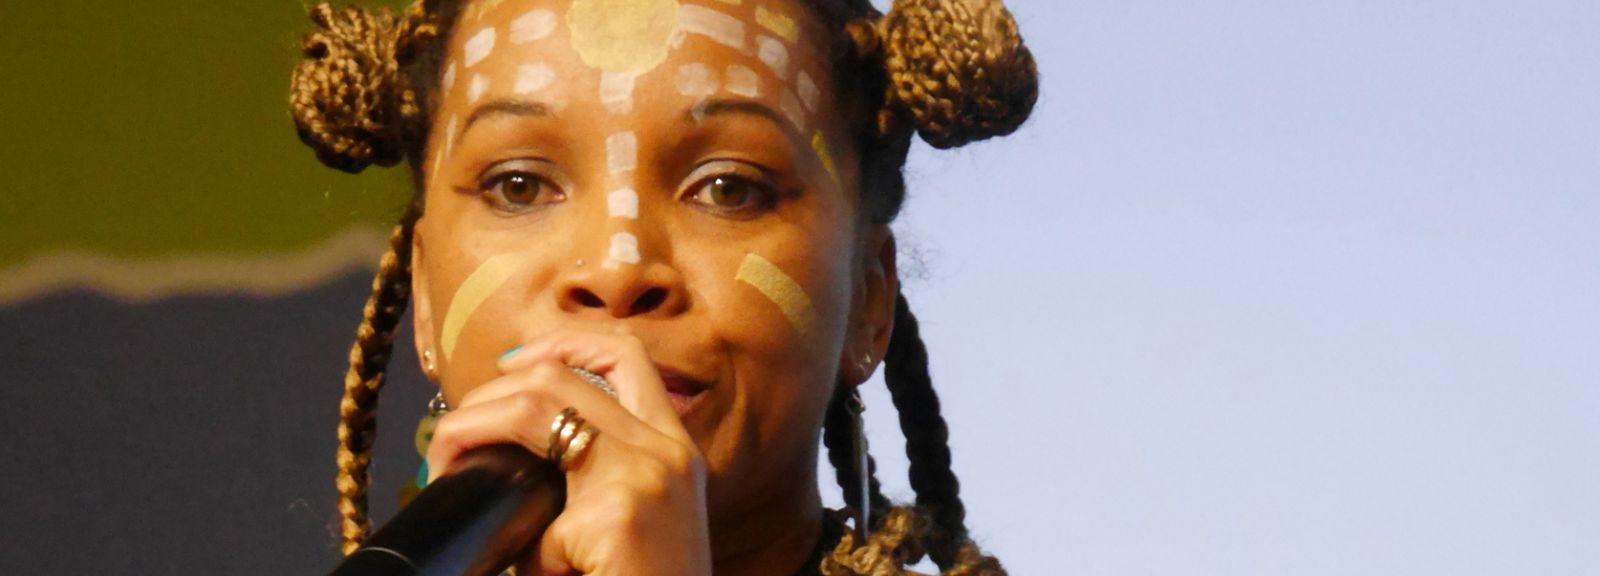 Concert d'Olga del Madagascar © F. Andreone